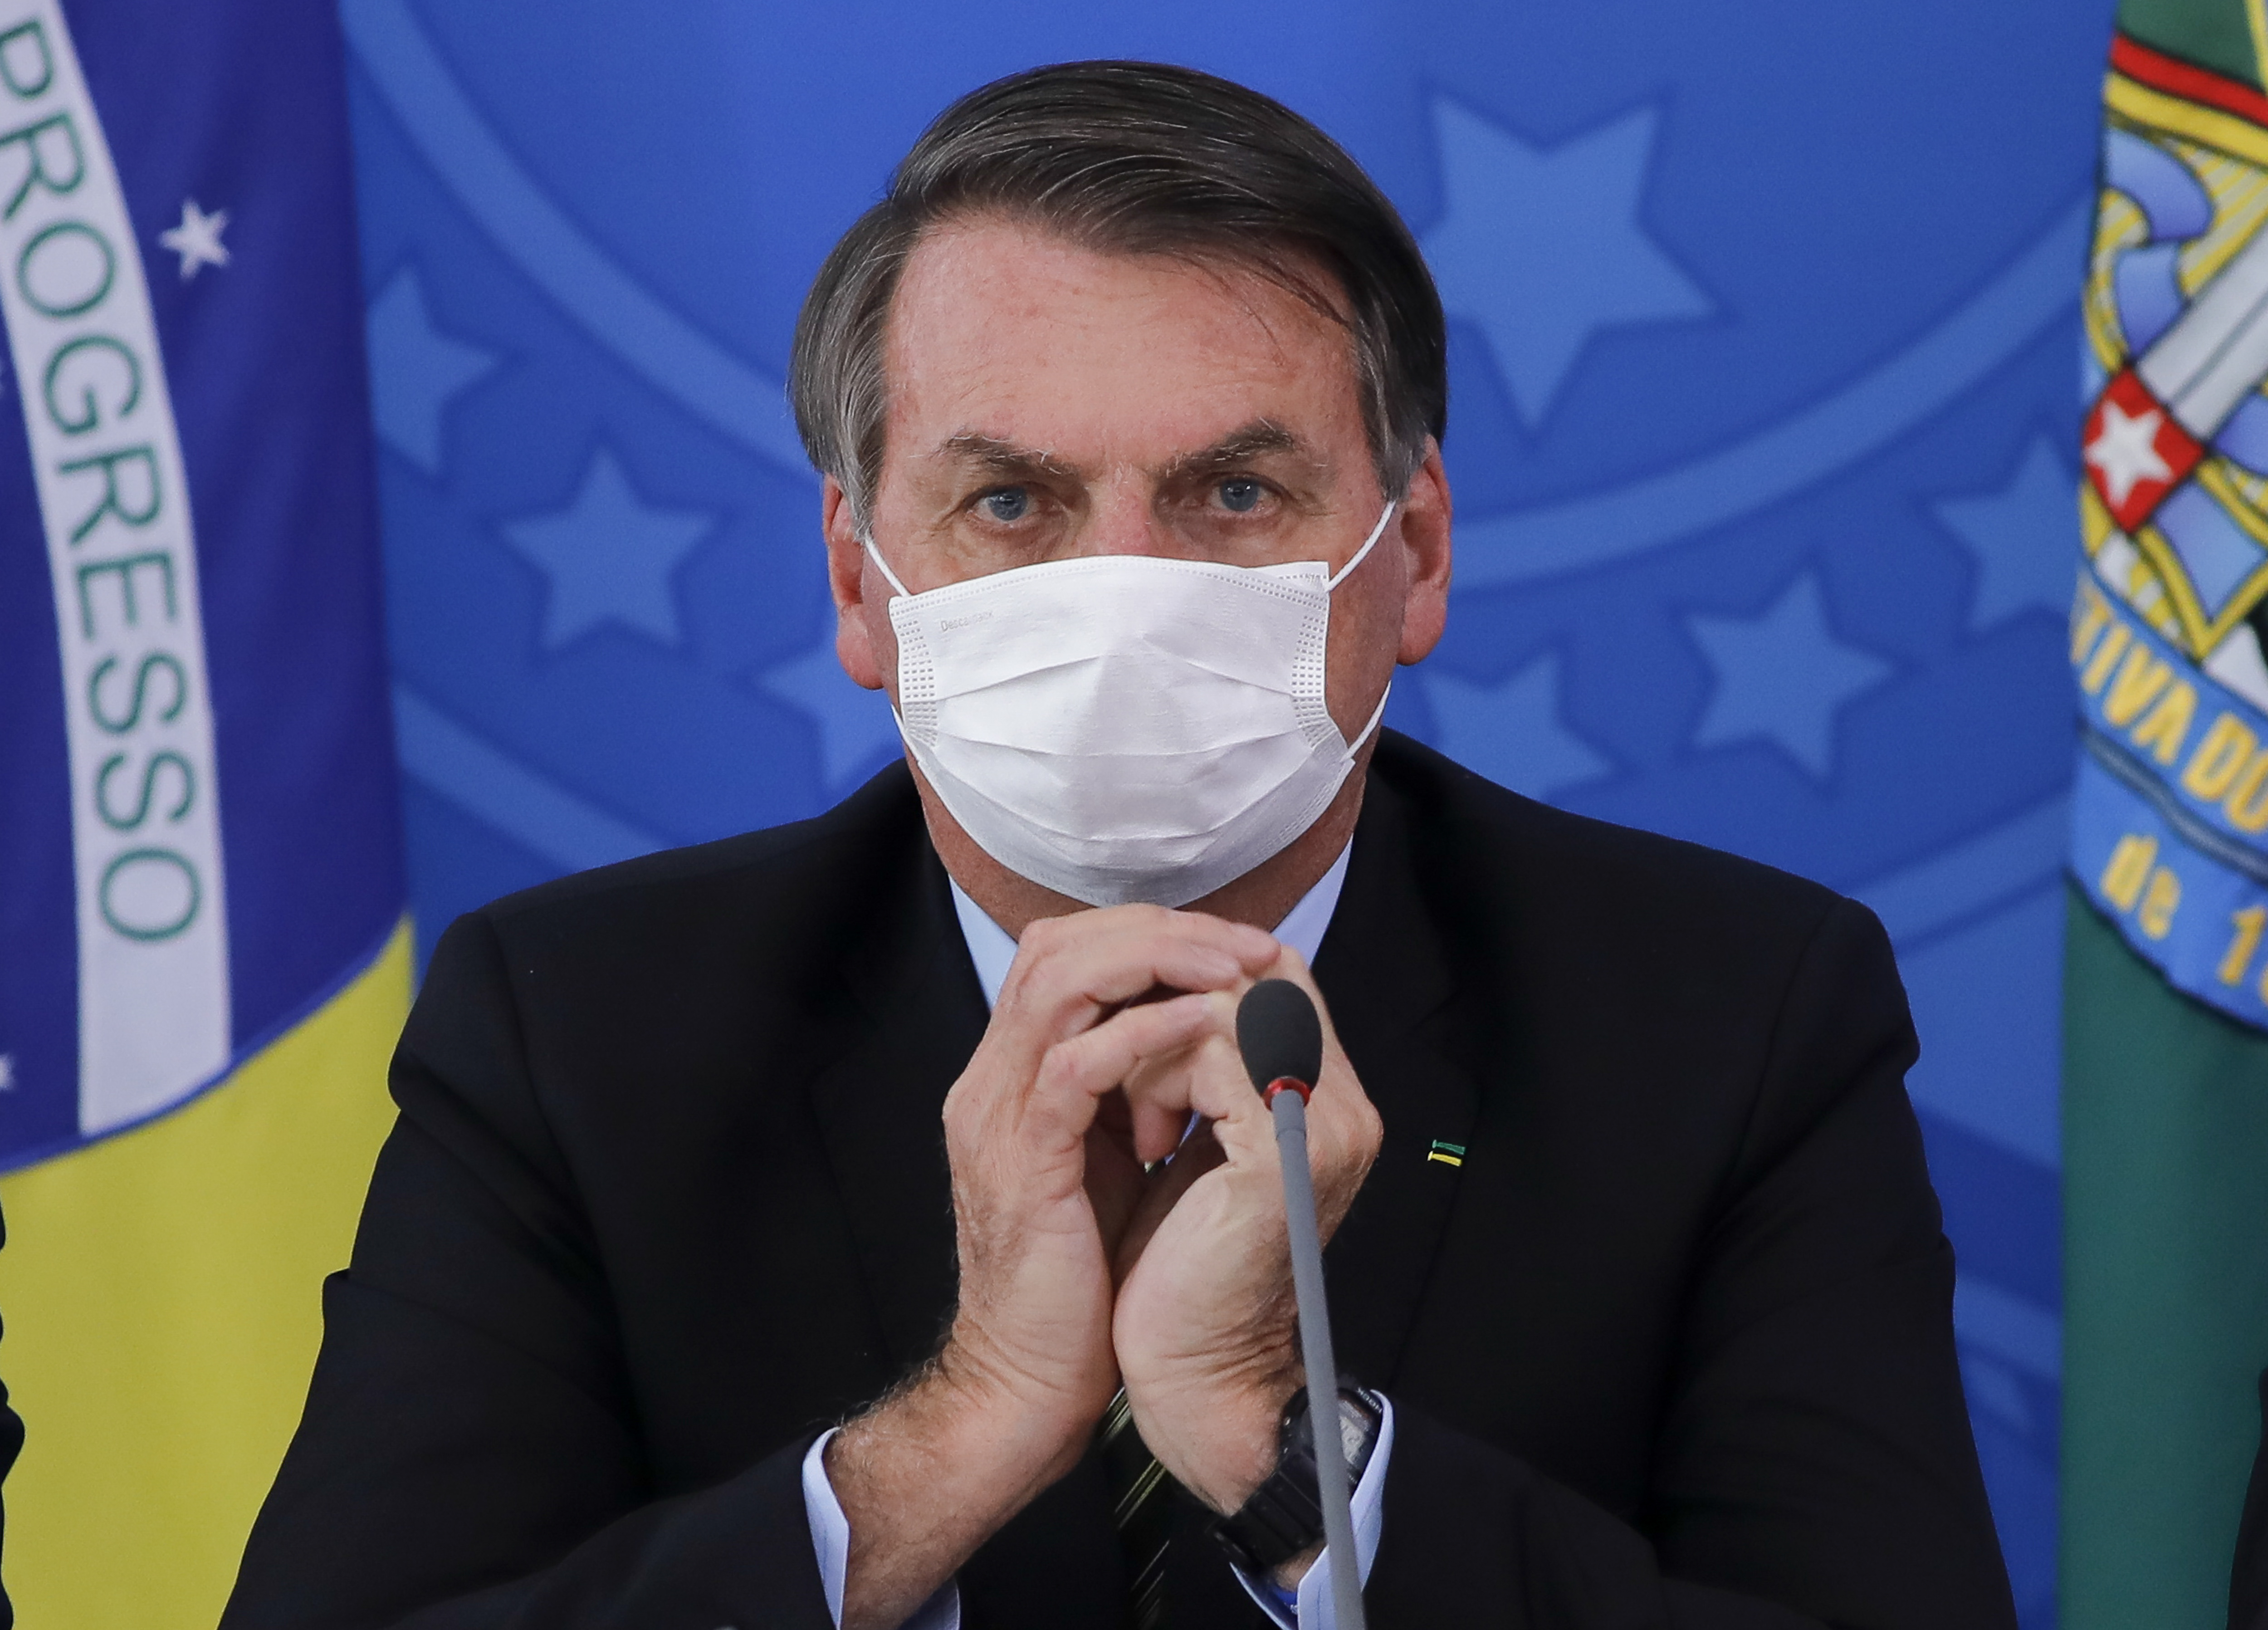 Bolsonaro brazil elnök második fia is koronavírusos lett